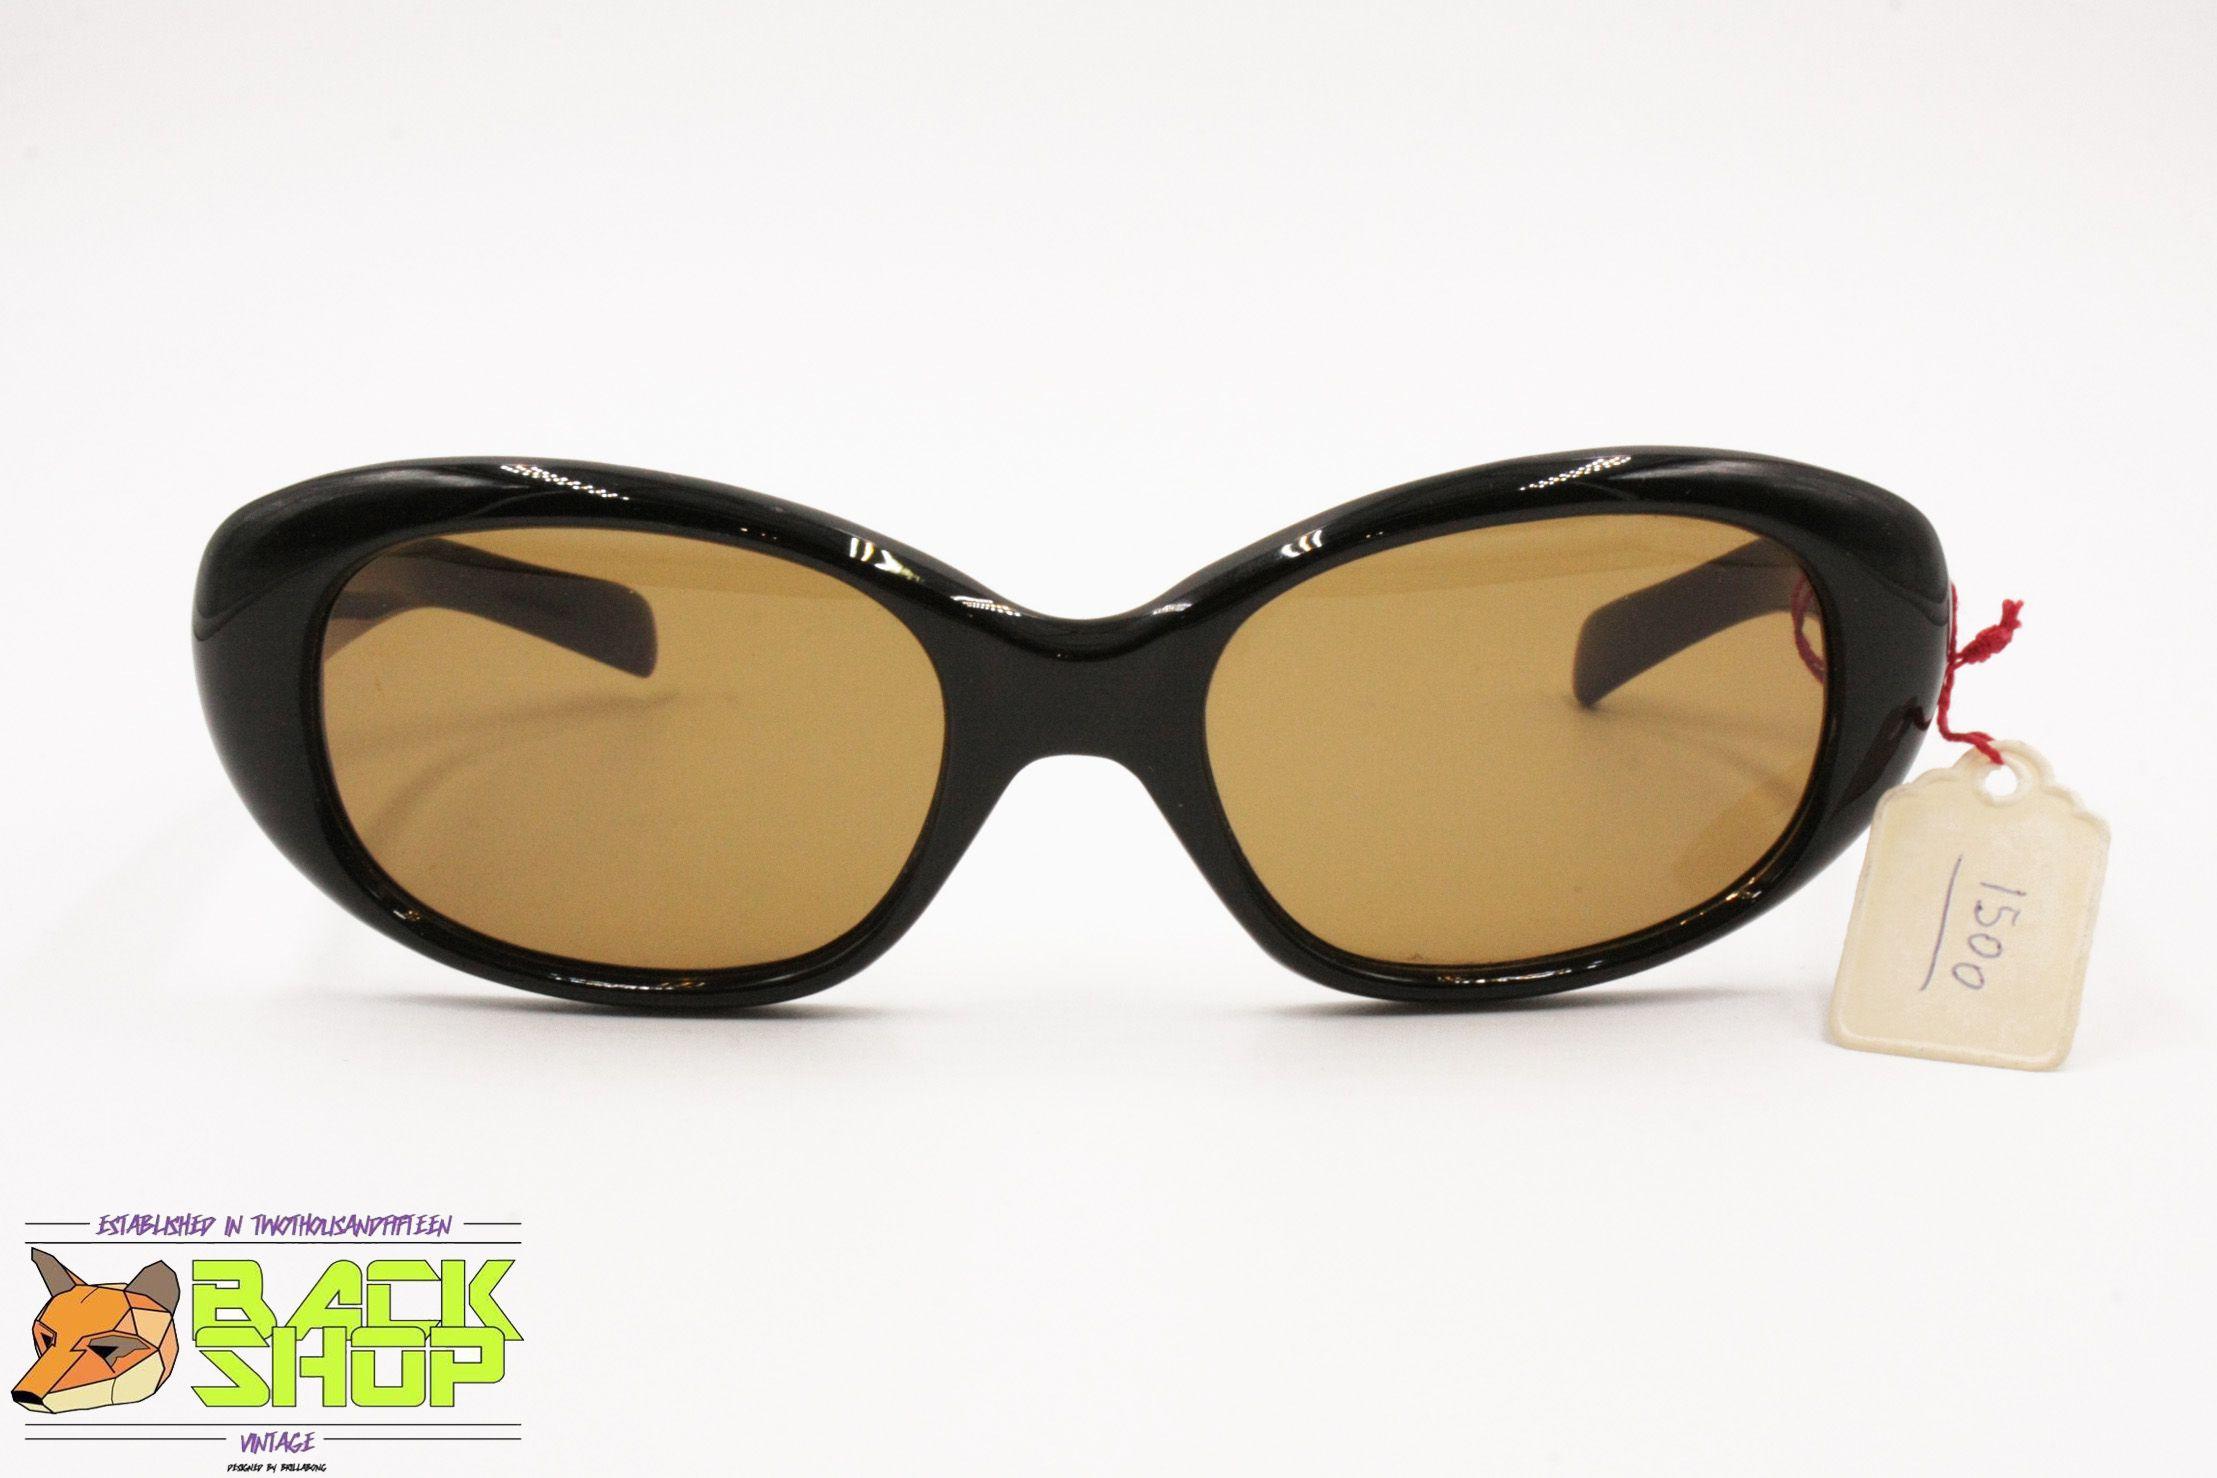 392d06bc9c916 Authentic 1950s - 1960s sunglasses Cat eye women ladies